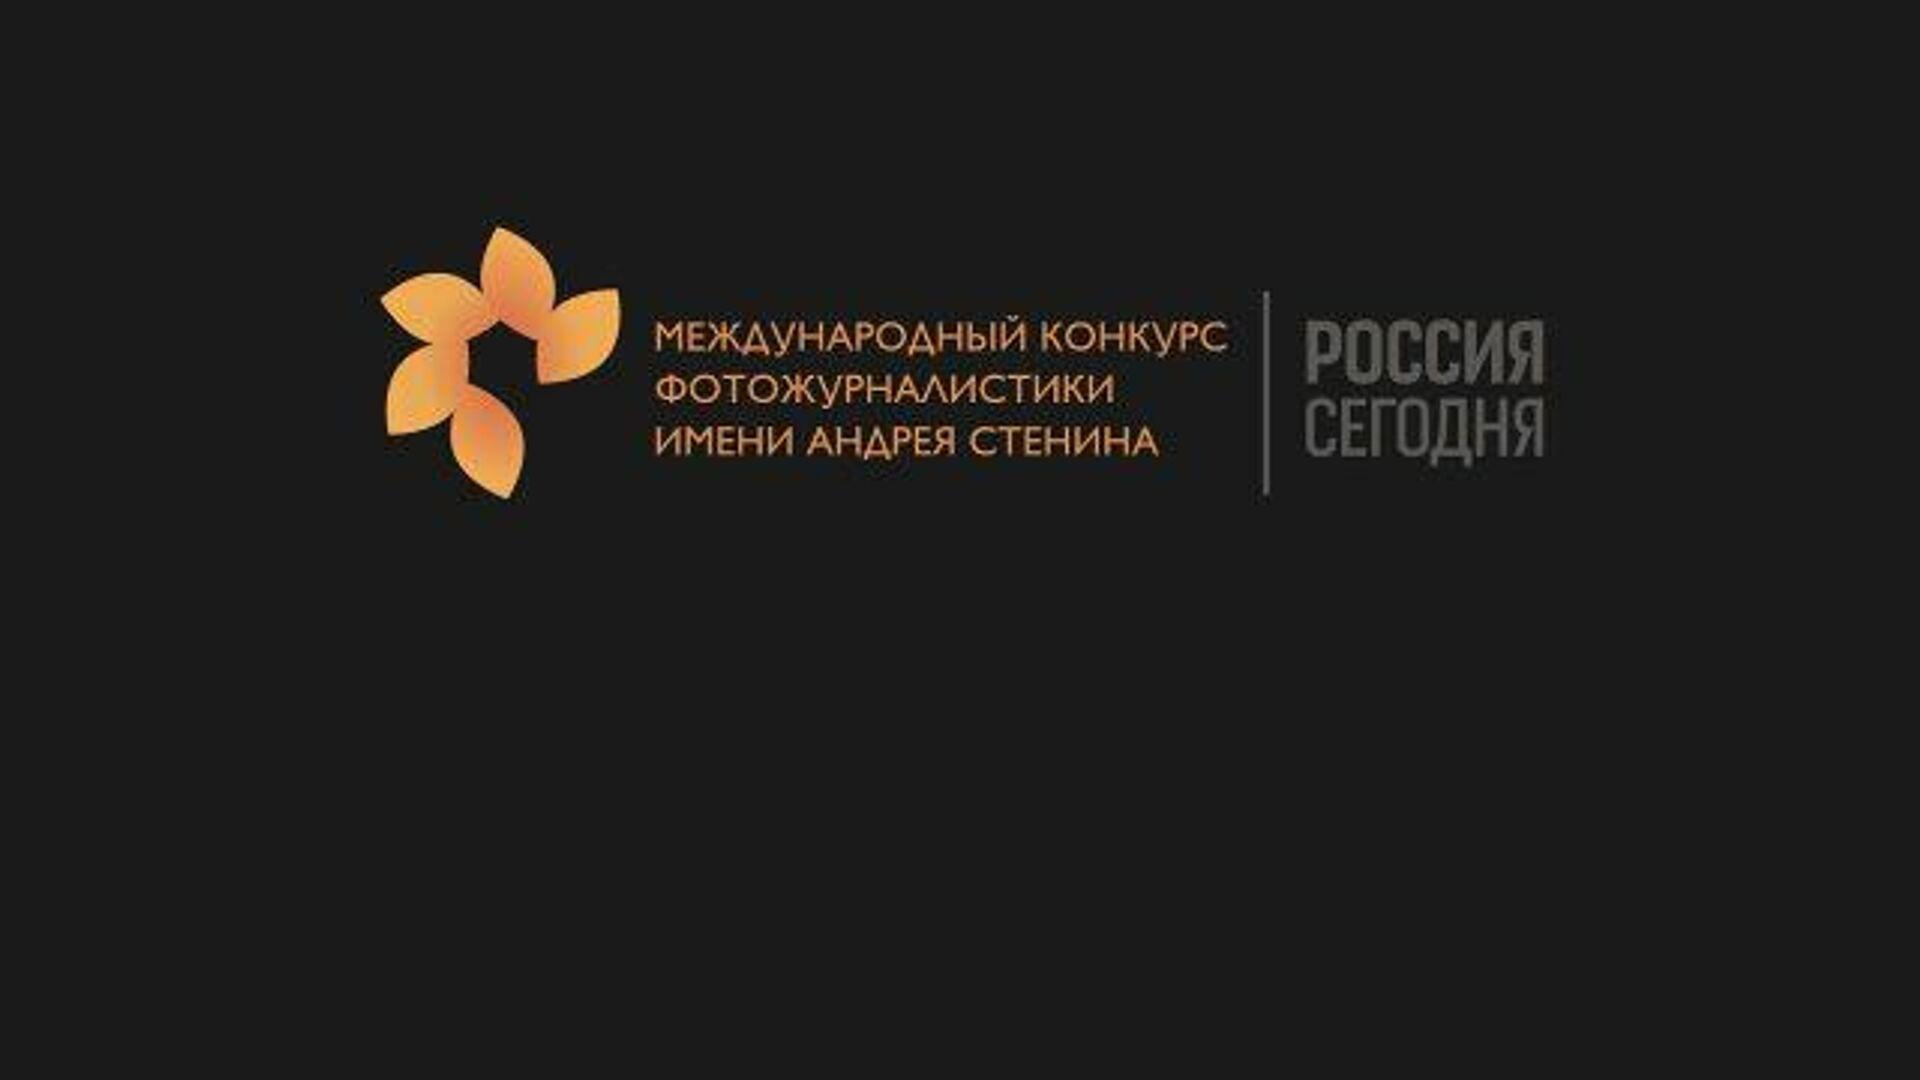 Итоги конкурса имени Андрея Стенина-2020 - РИА Новости, 1920, 22.10.2020